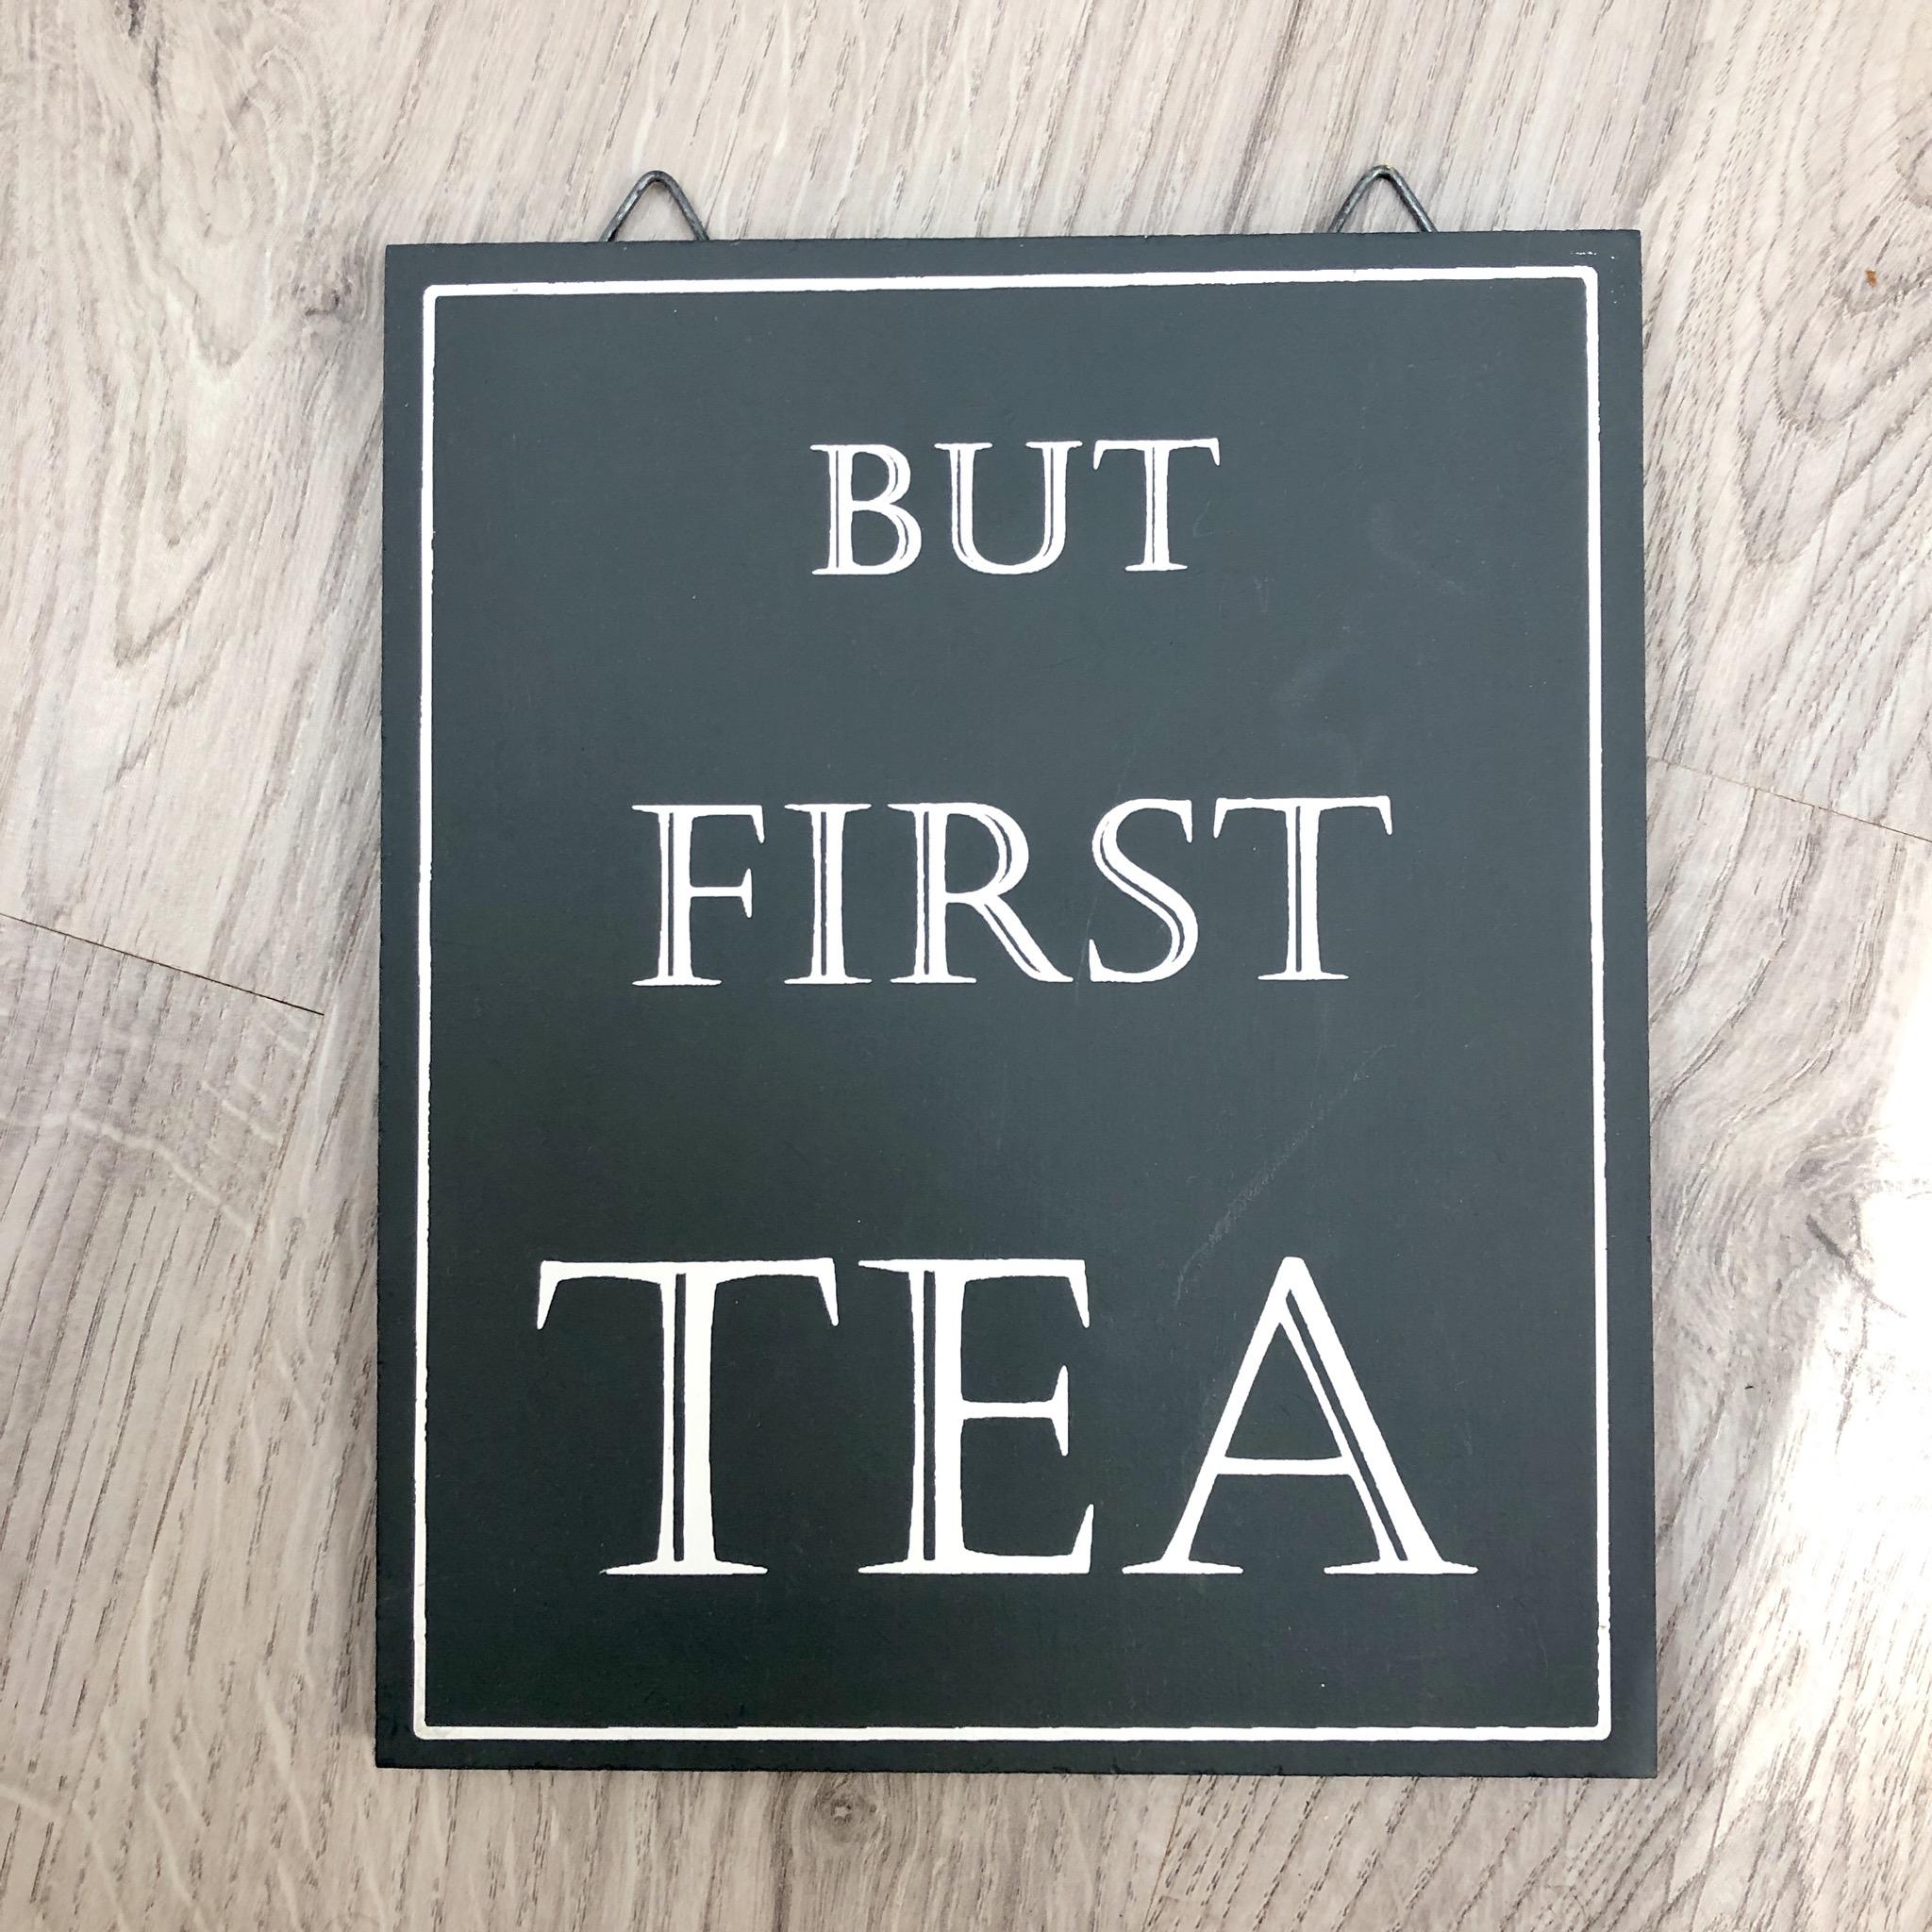 But first tea hanging sign by shoeless joe